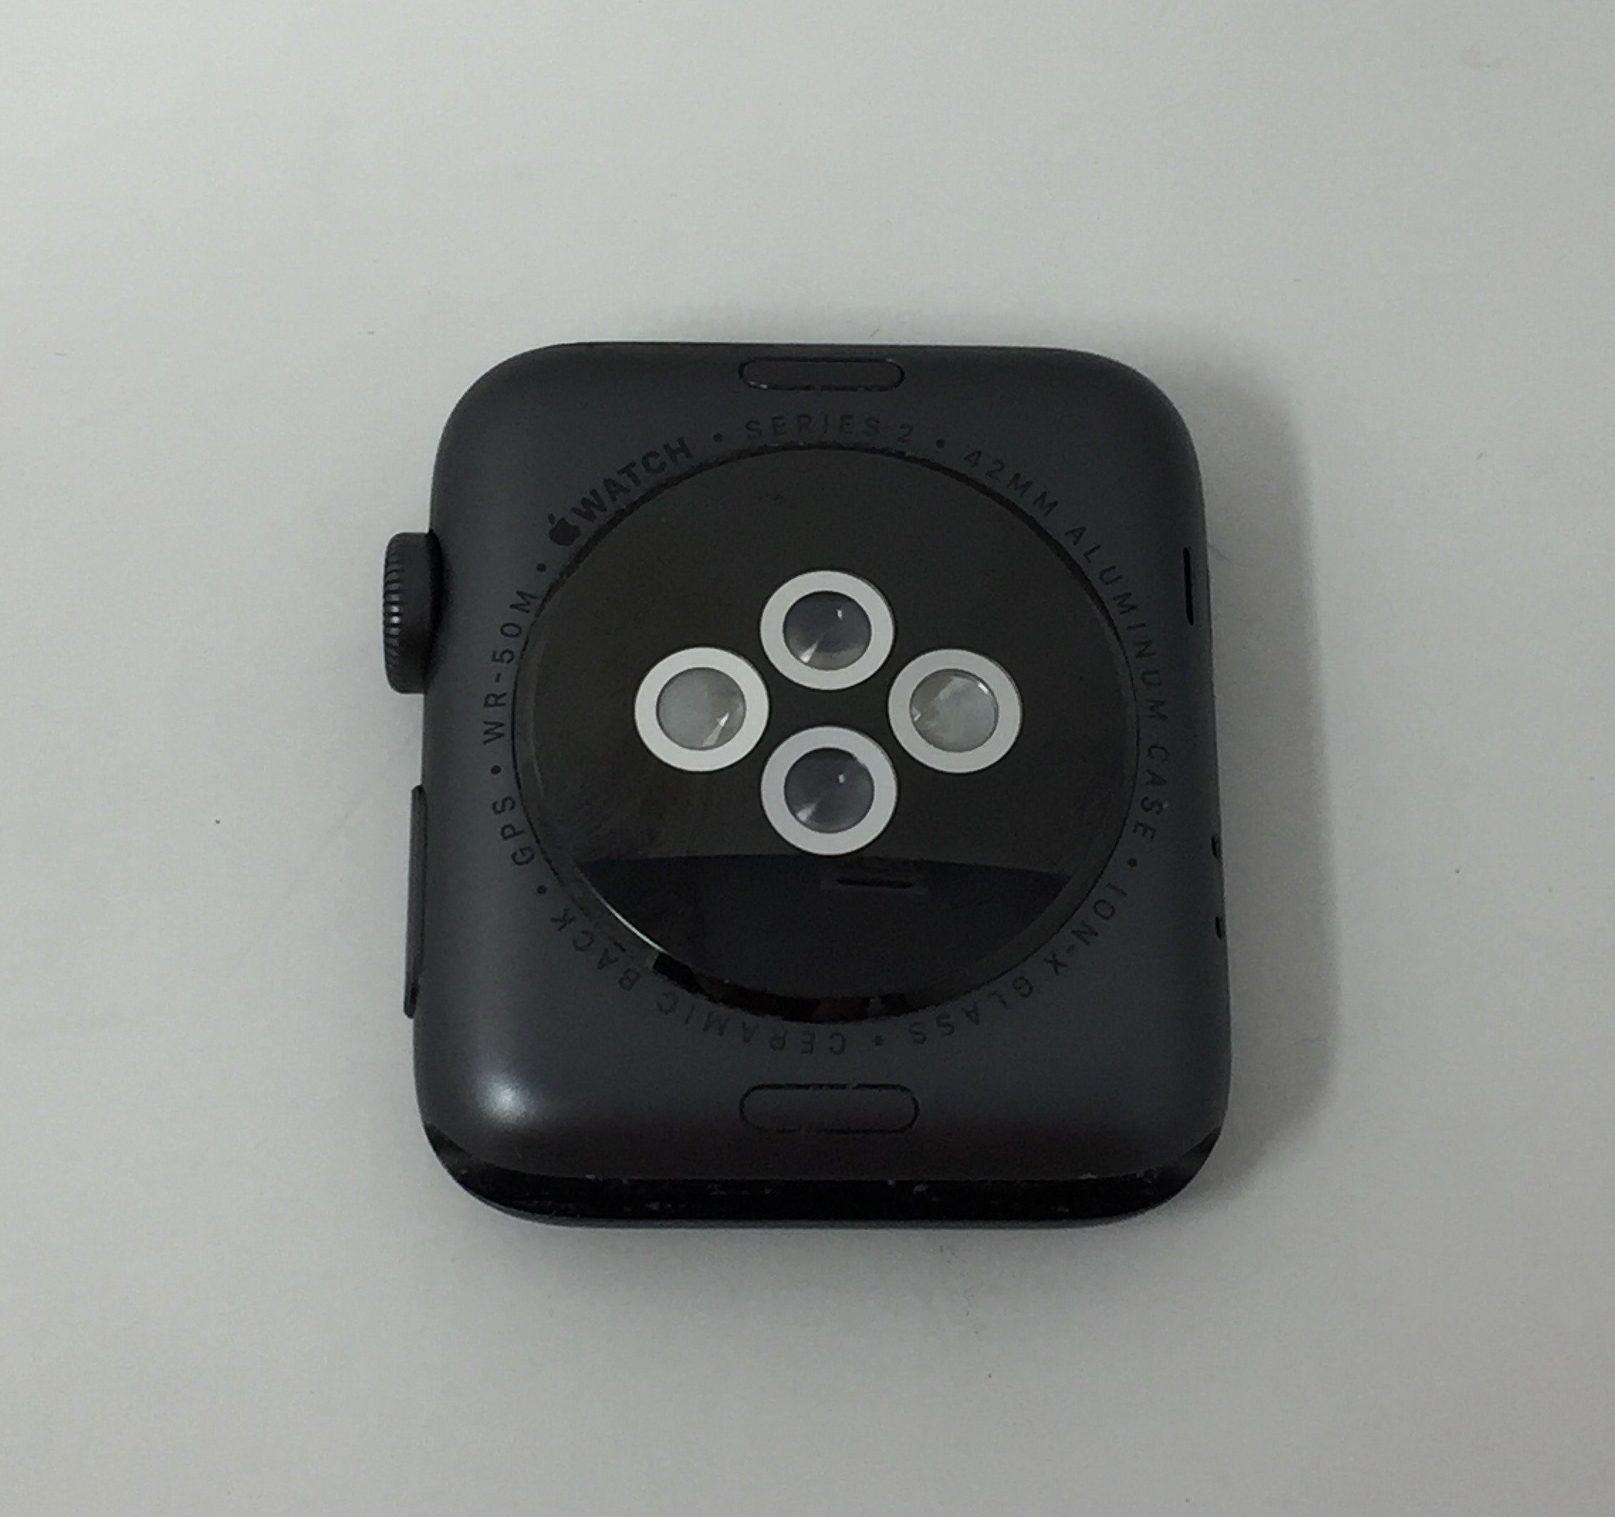 Watch Series 2 Aluminum (42mm), Space Gray, Black Sport Band, imagen 2